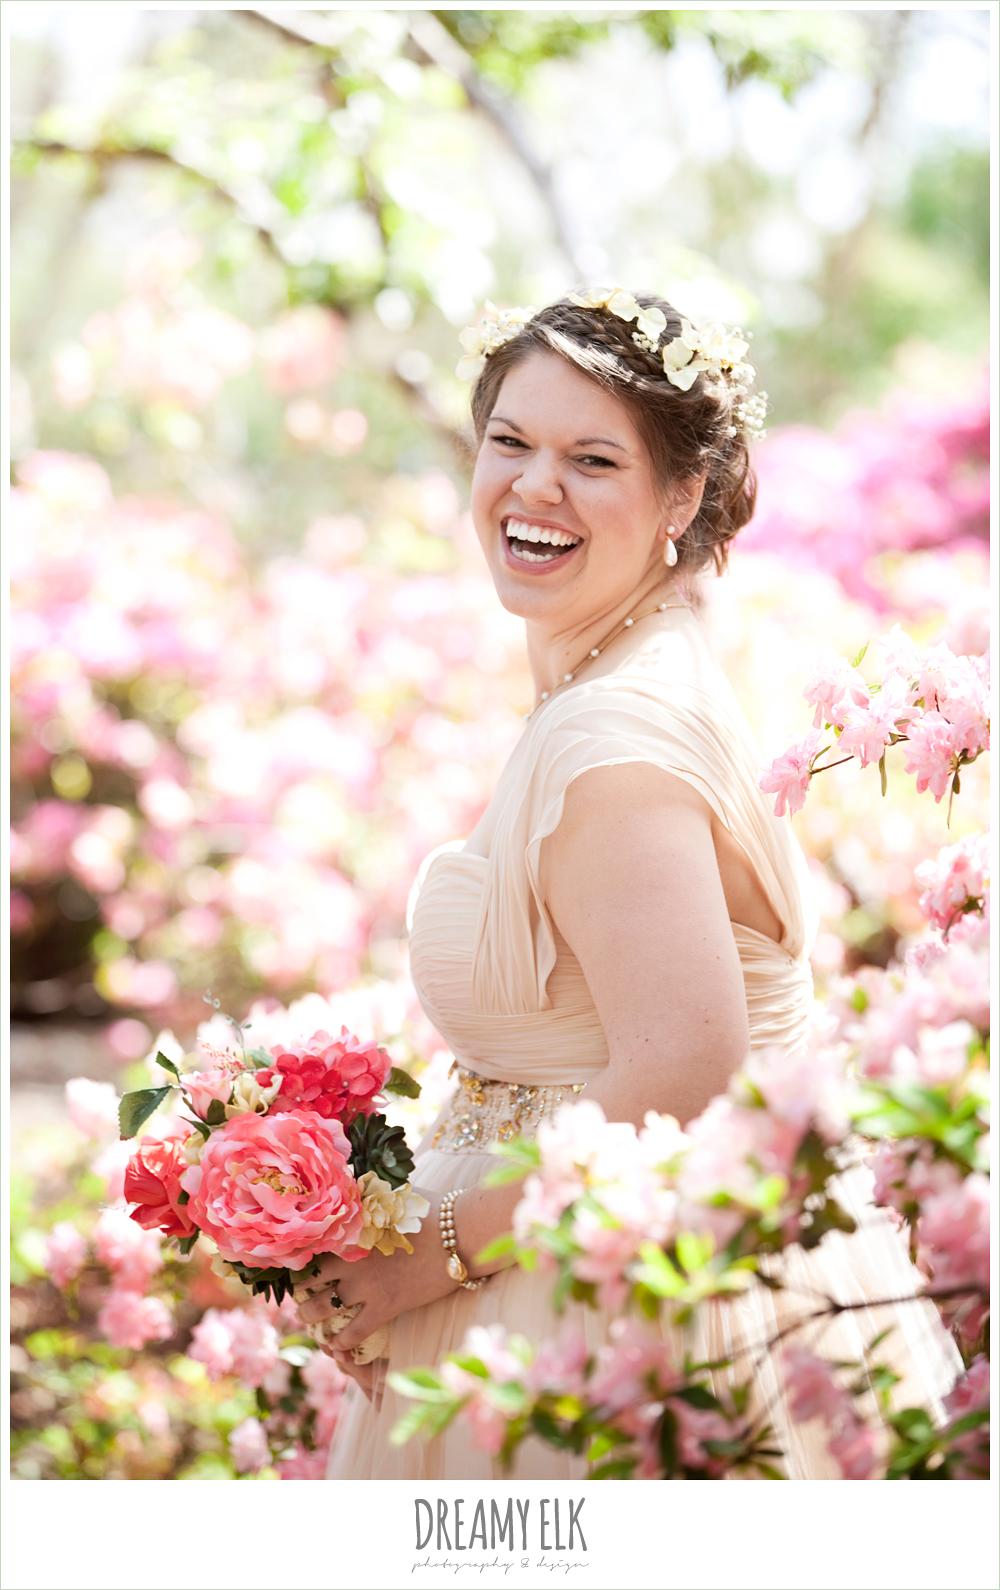 ashley, bridal photo contest, dallas arboretum